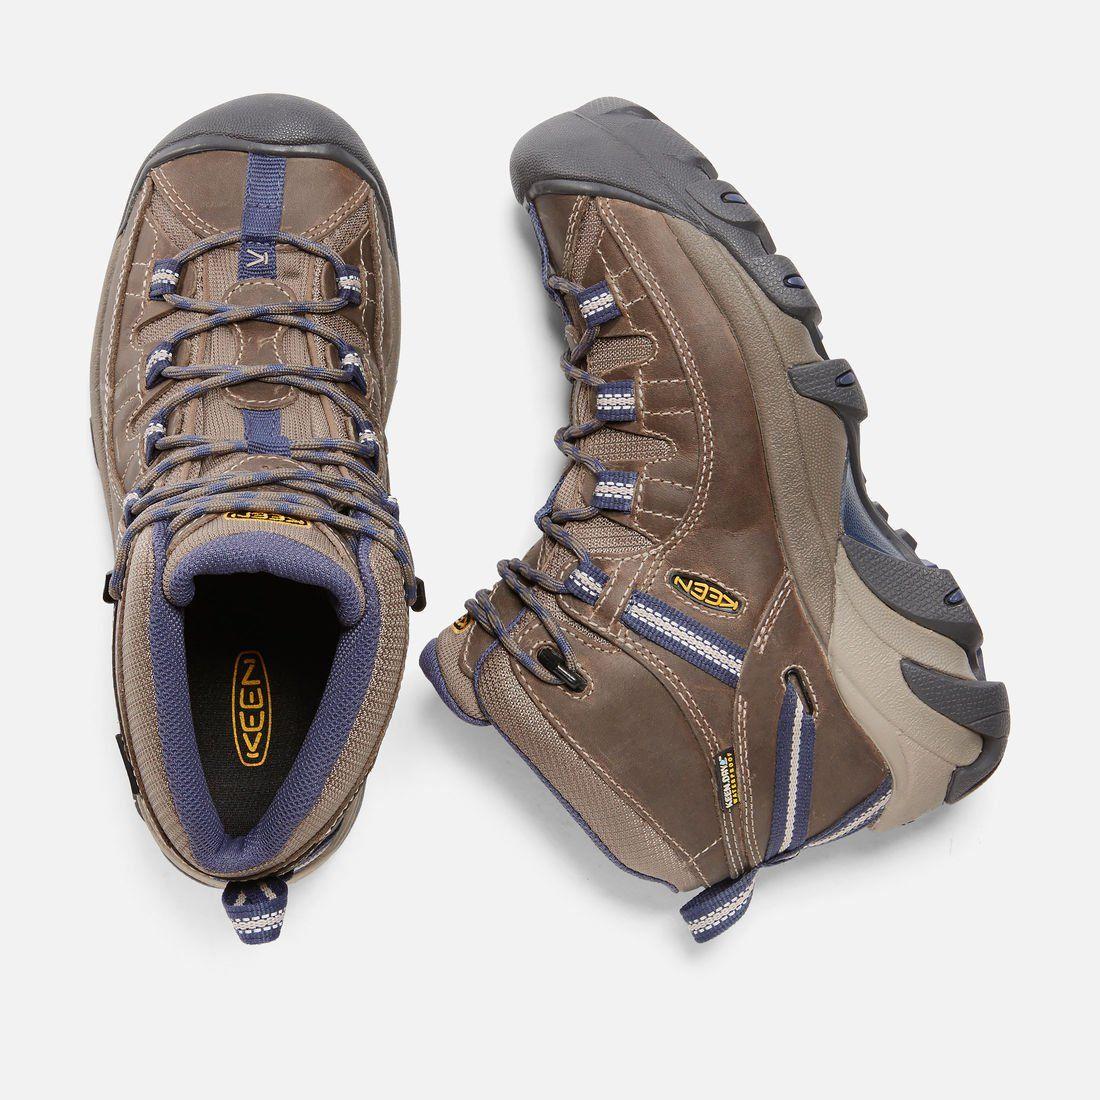 All Colors Apex V751 Sierra Trail Men/'s Hiker Shoe All Sizes